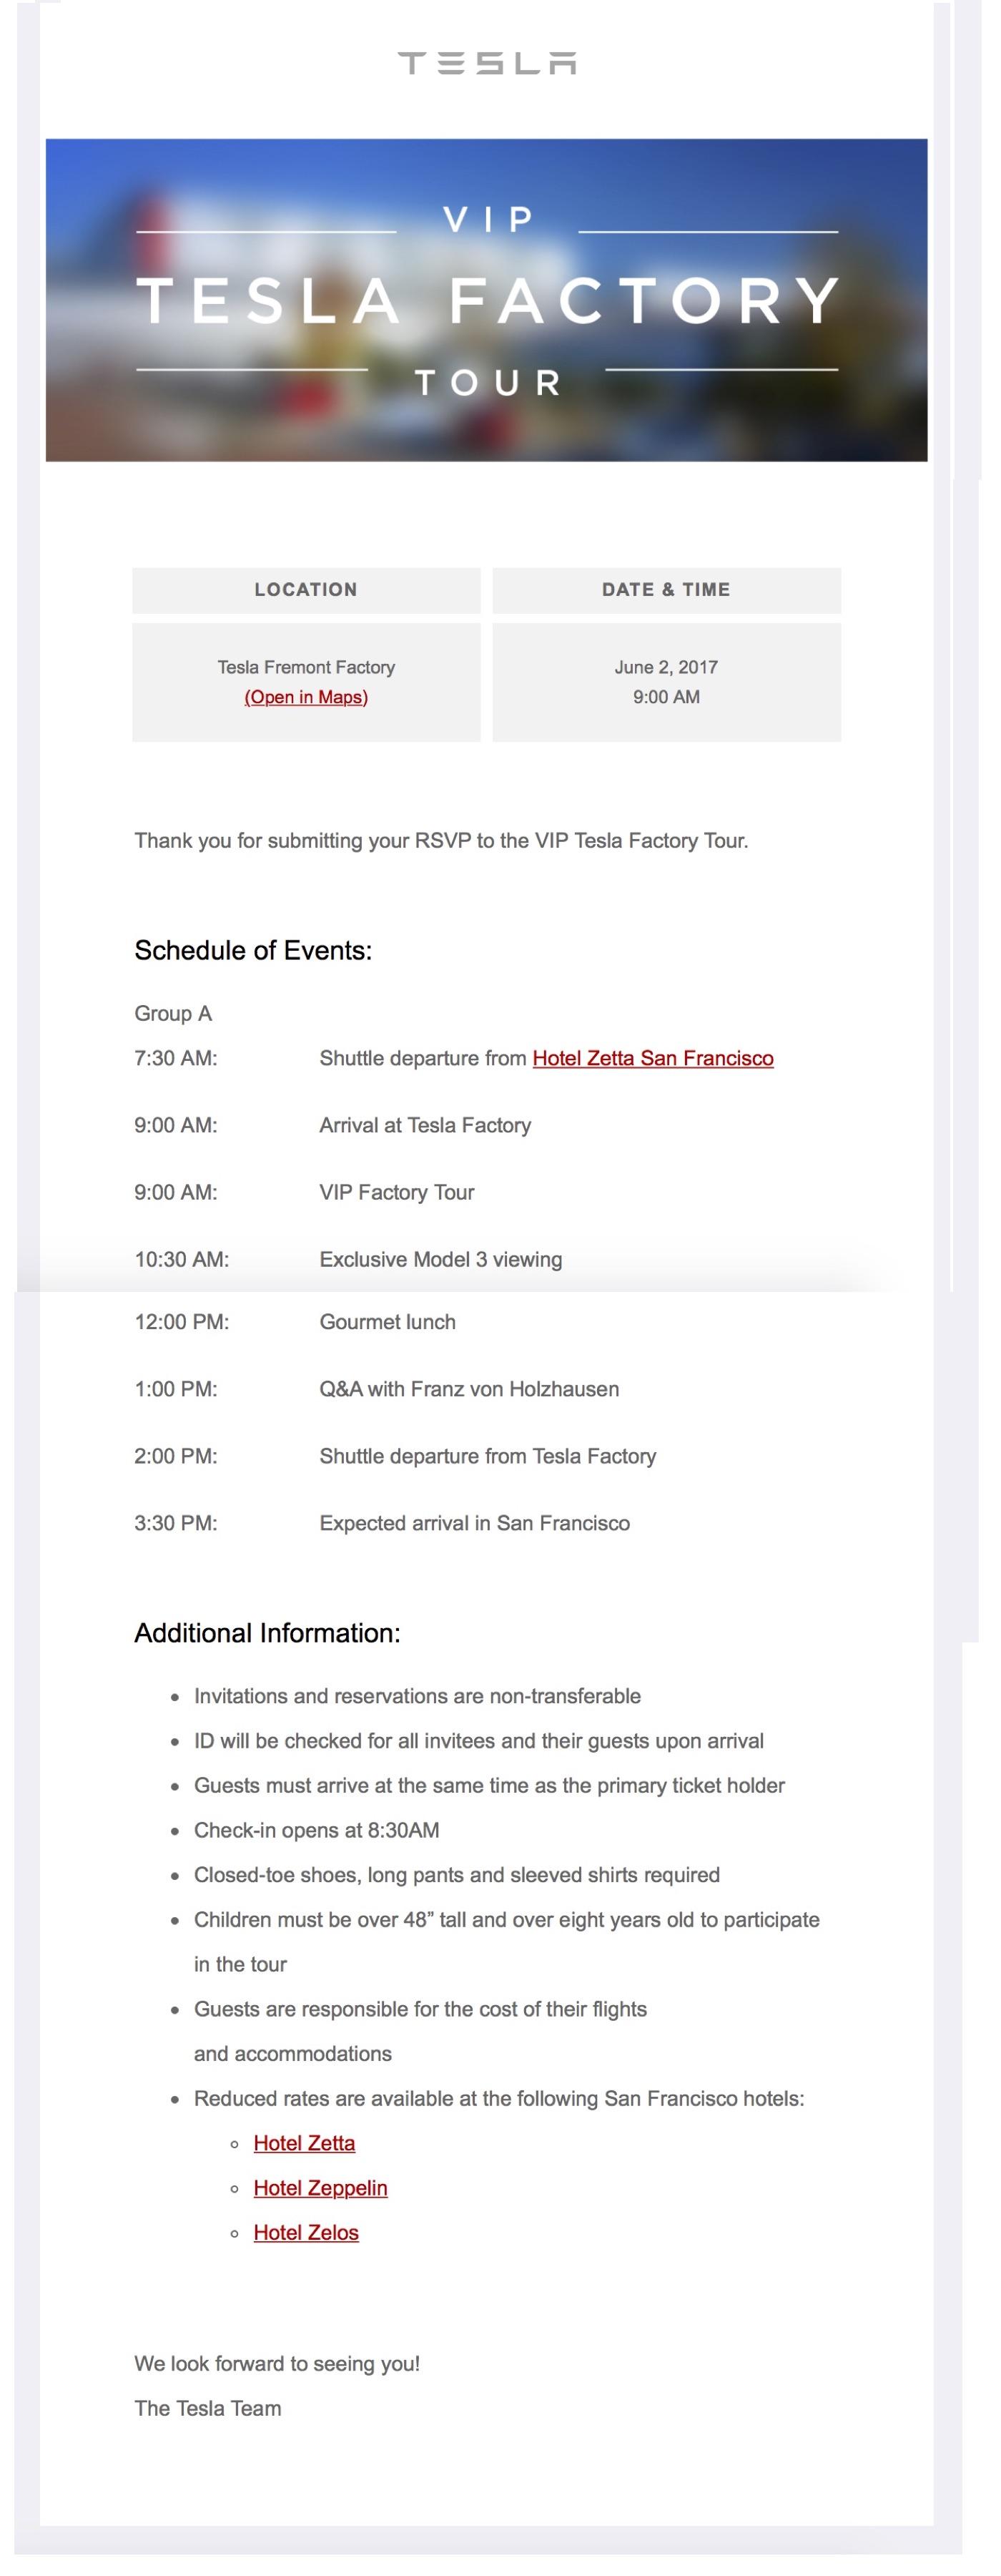 tesla-vip-factour-tour-itinerary